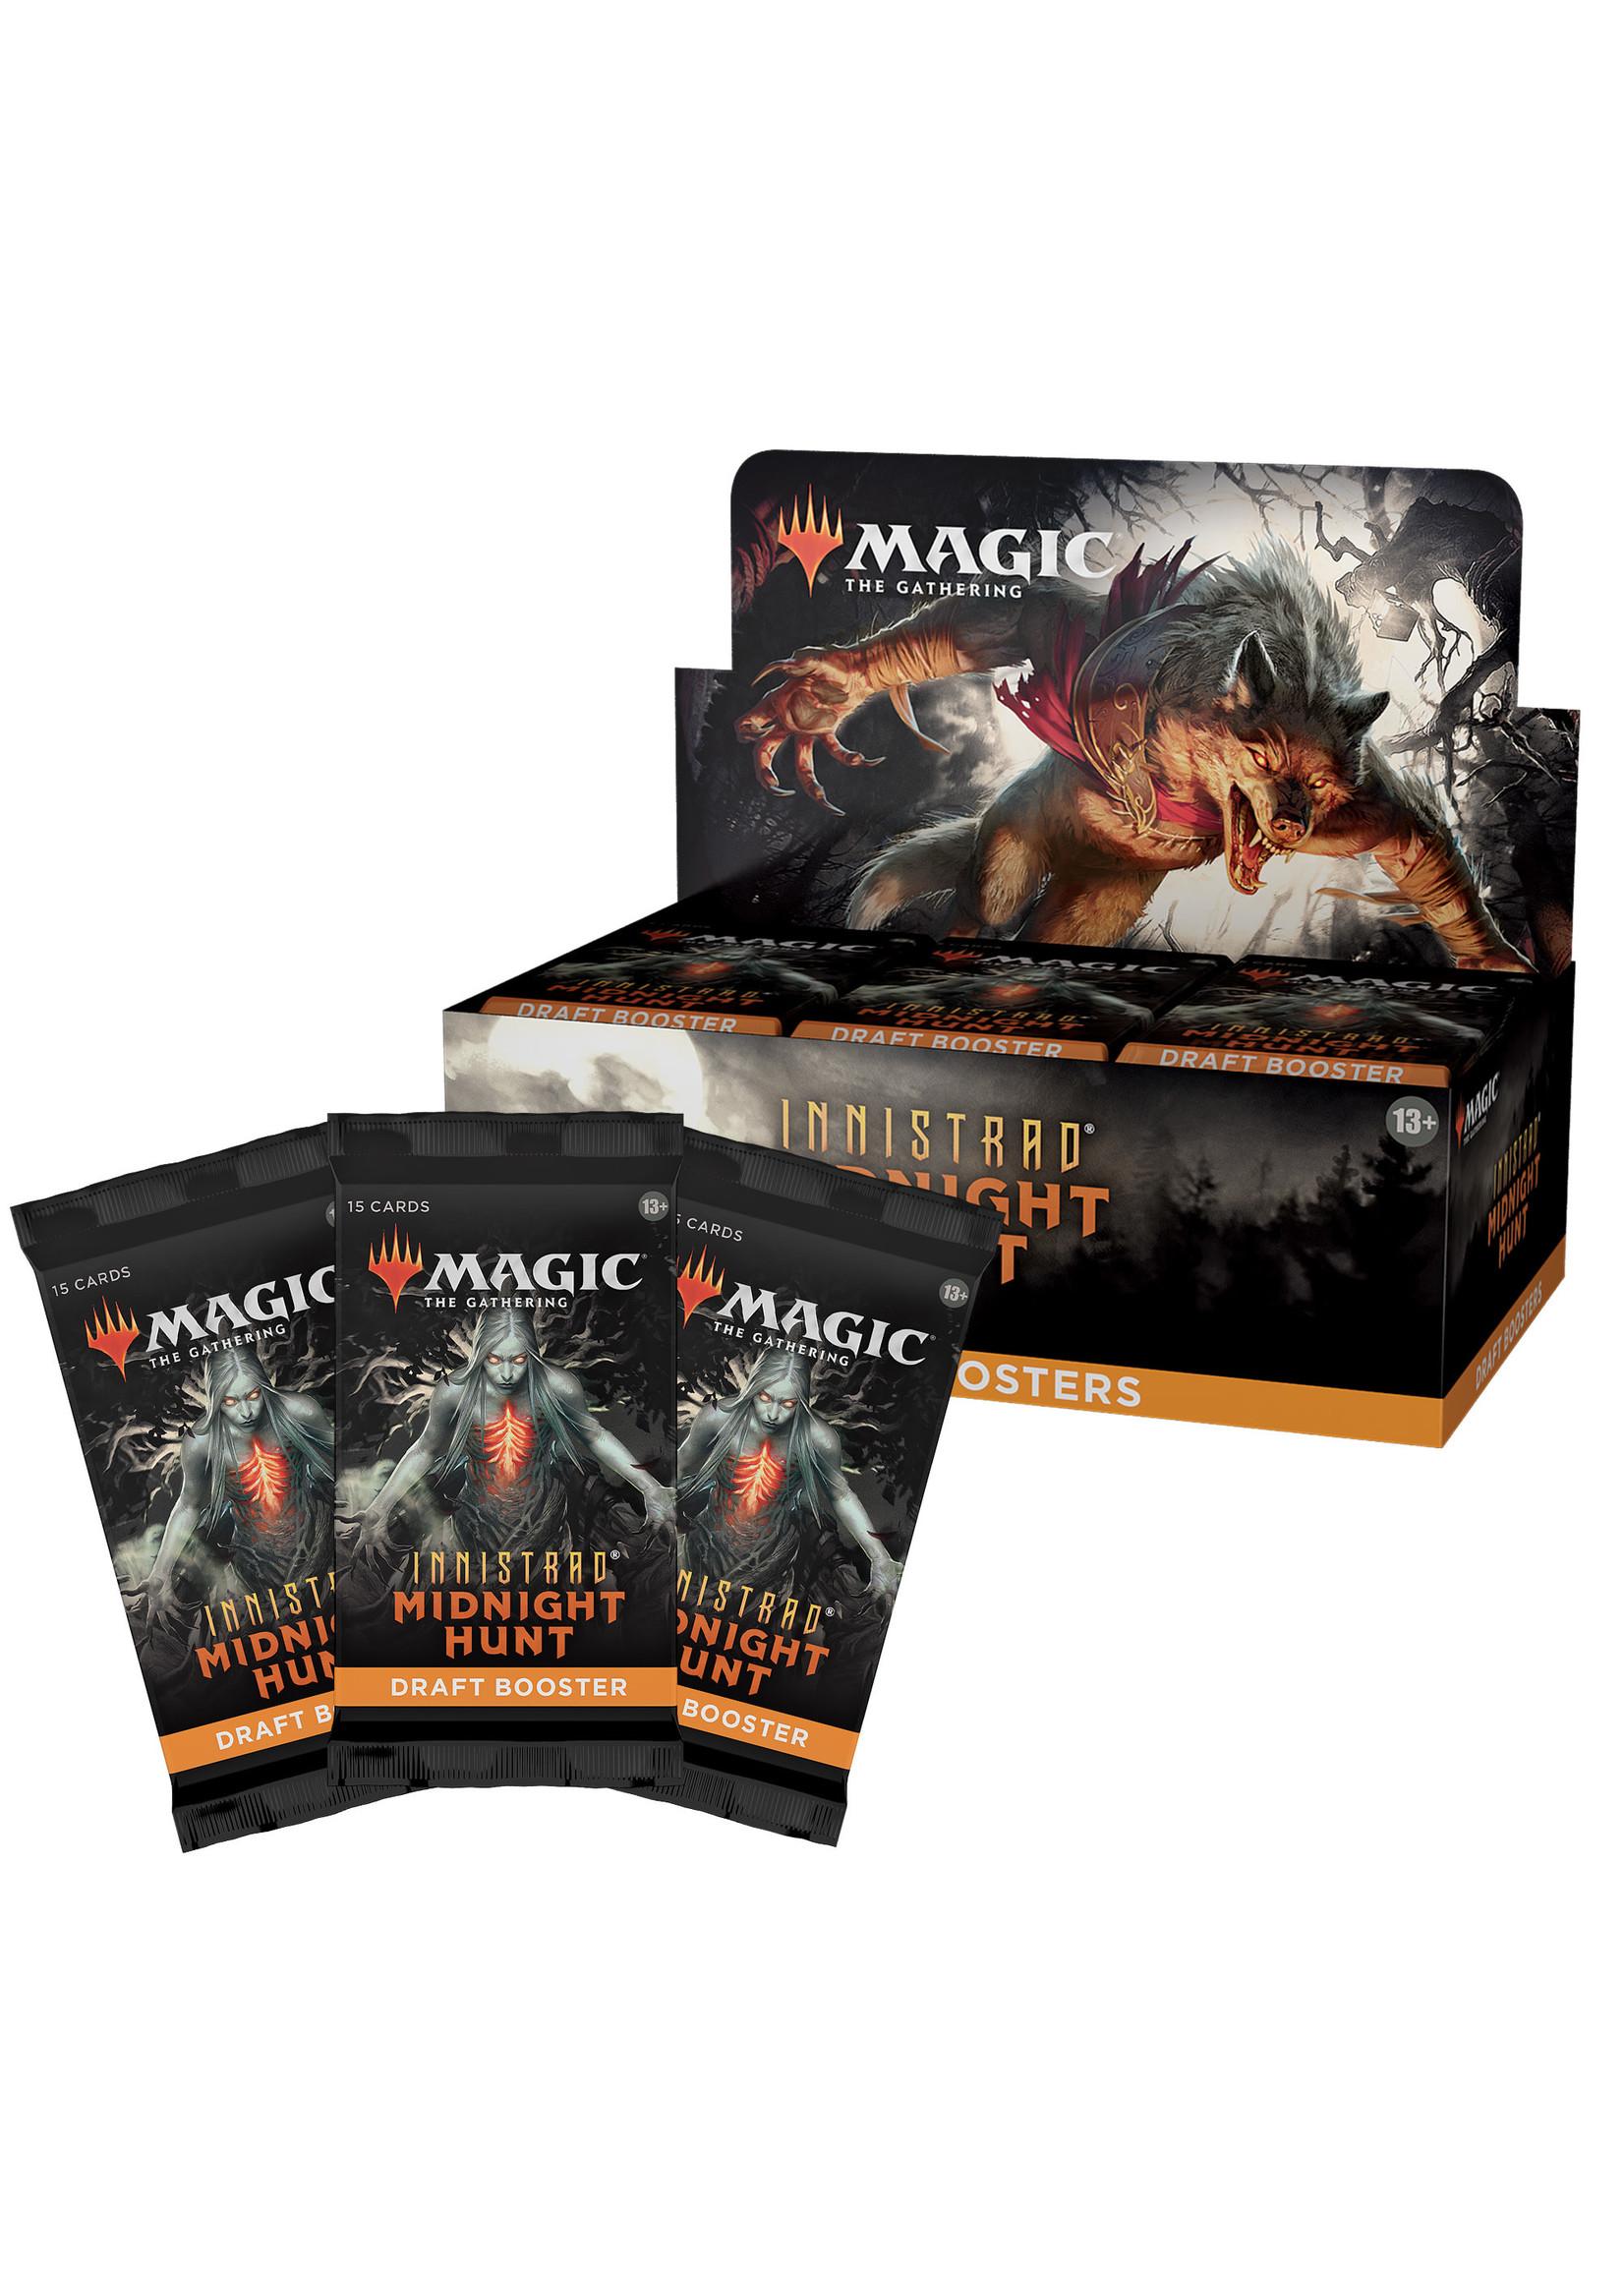 Magic: The Gathering Innistrad Midnight Hunt Draft Booster Box (36)